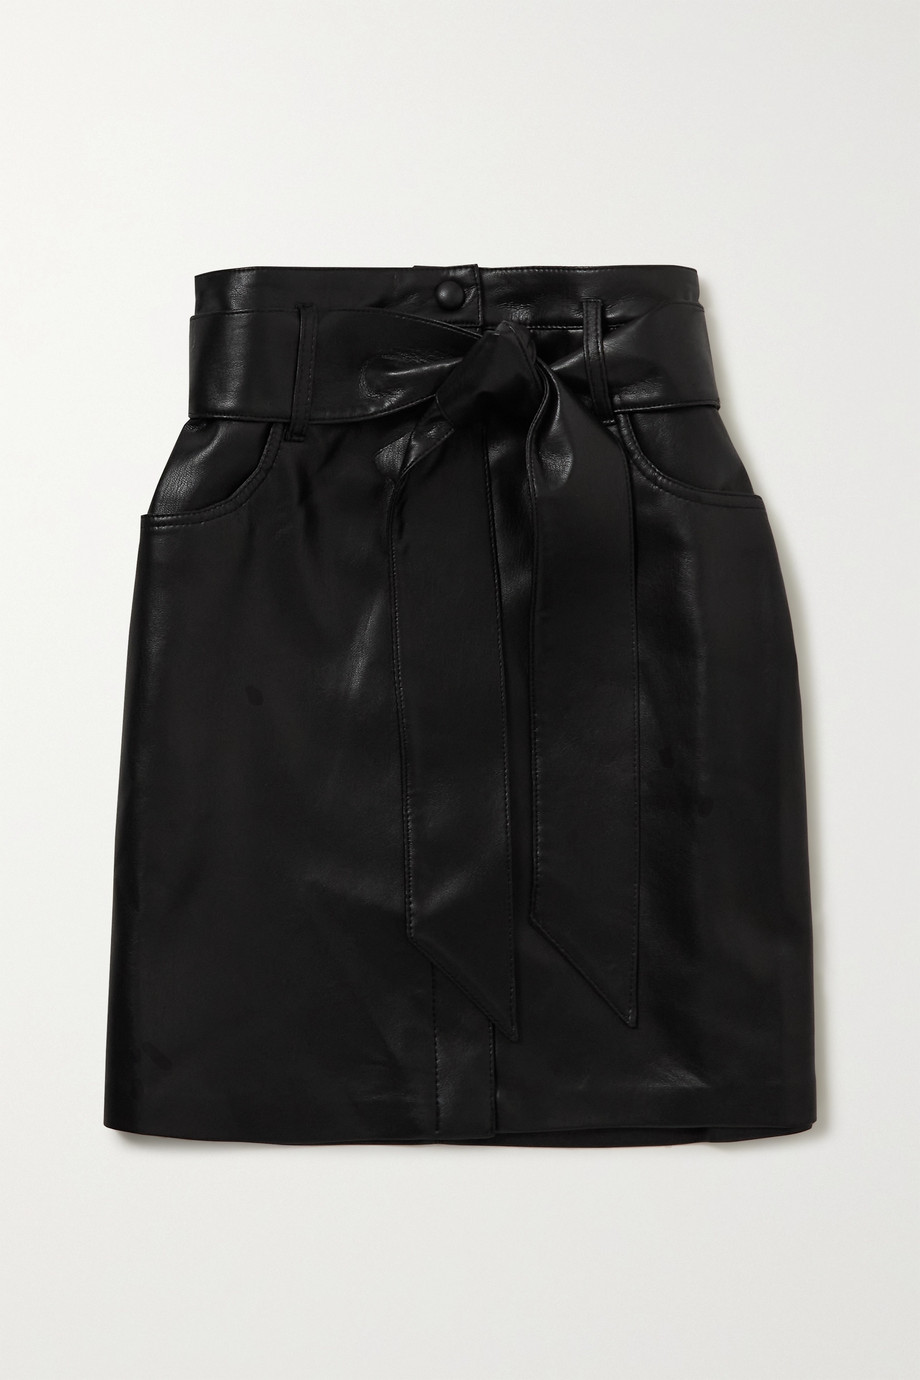 Nanushka Meda belted vegan leather mini skirt